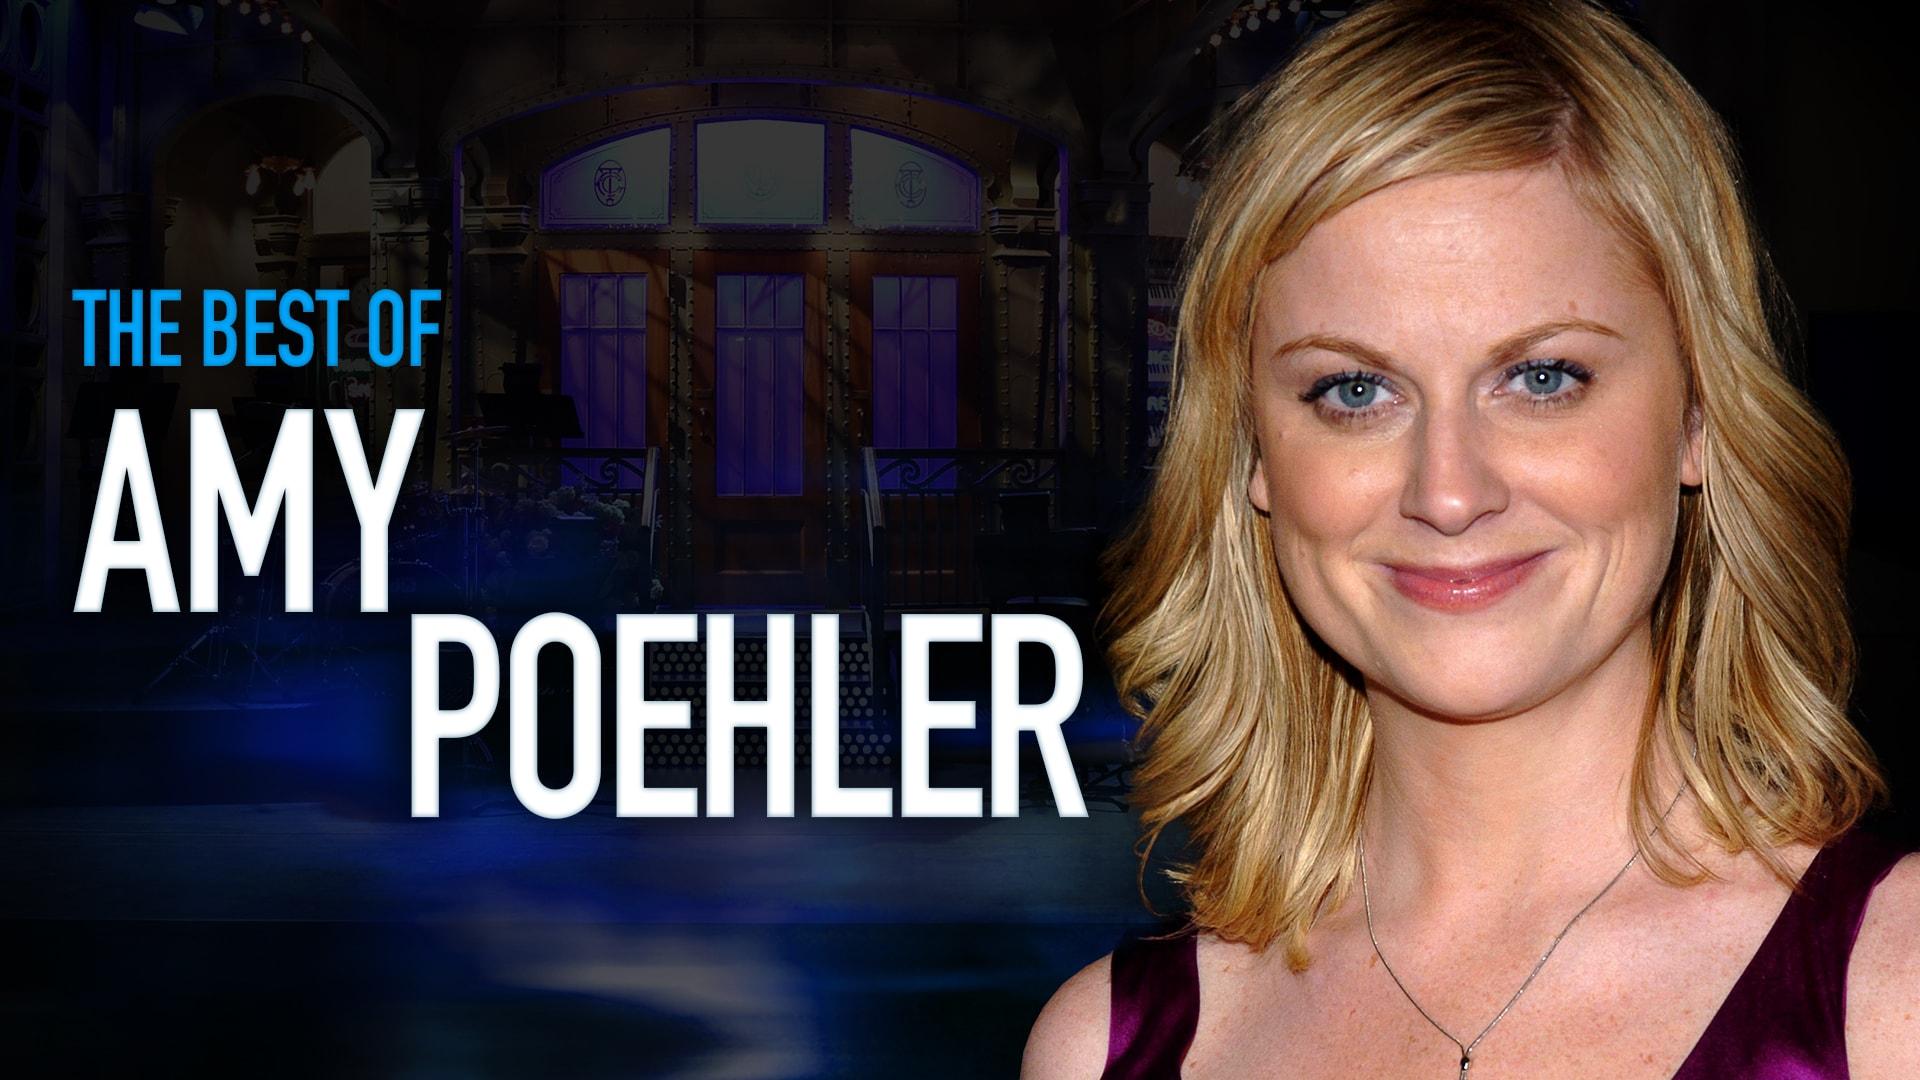 The Best of Amy Poehler